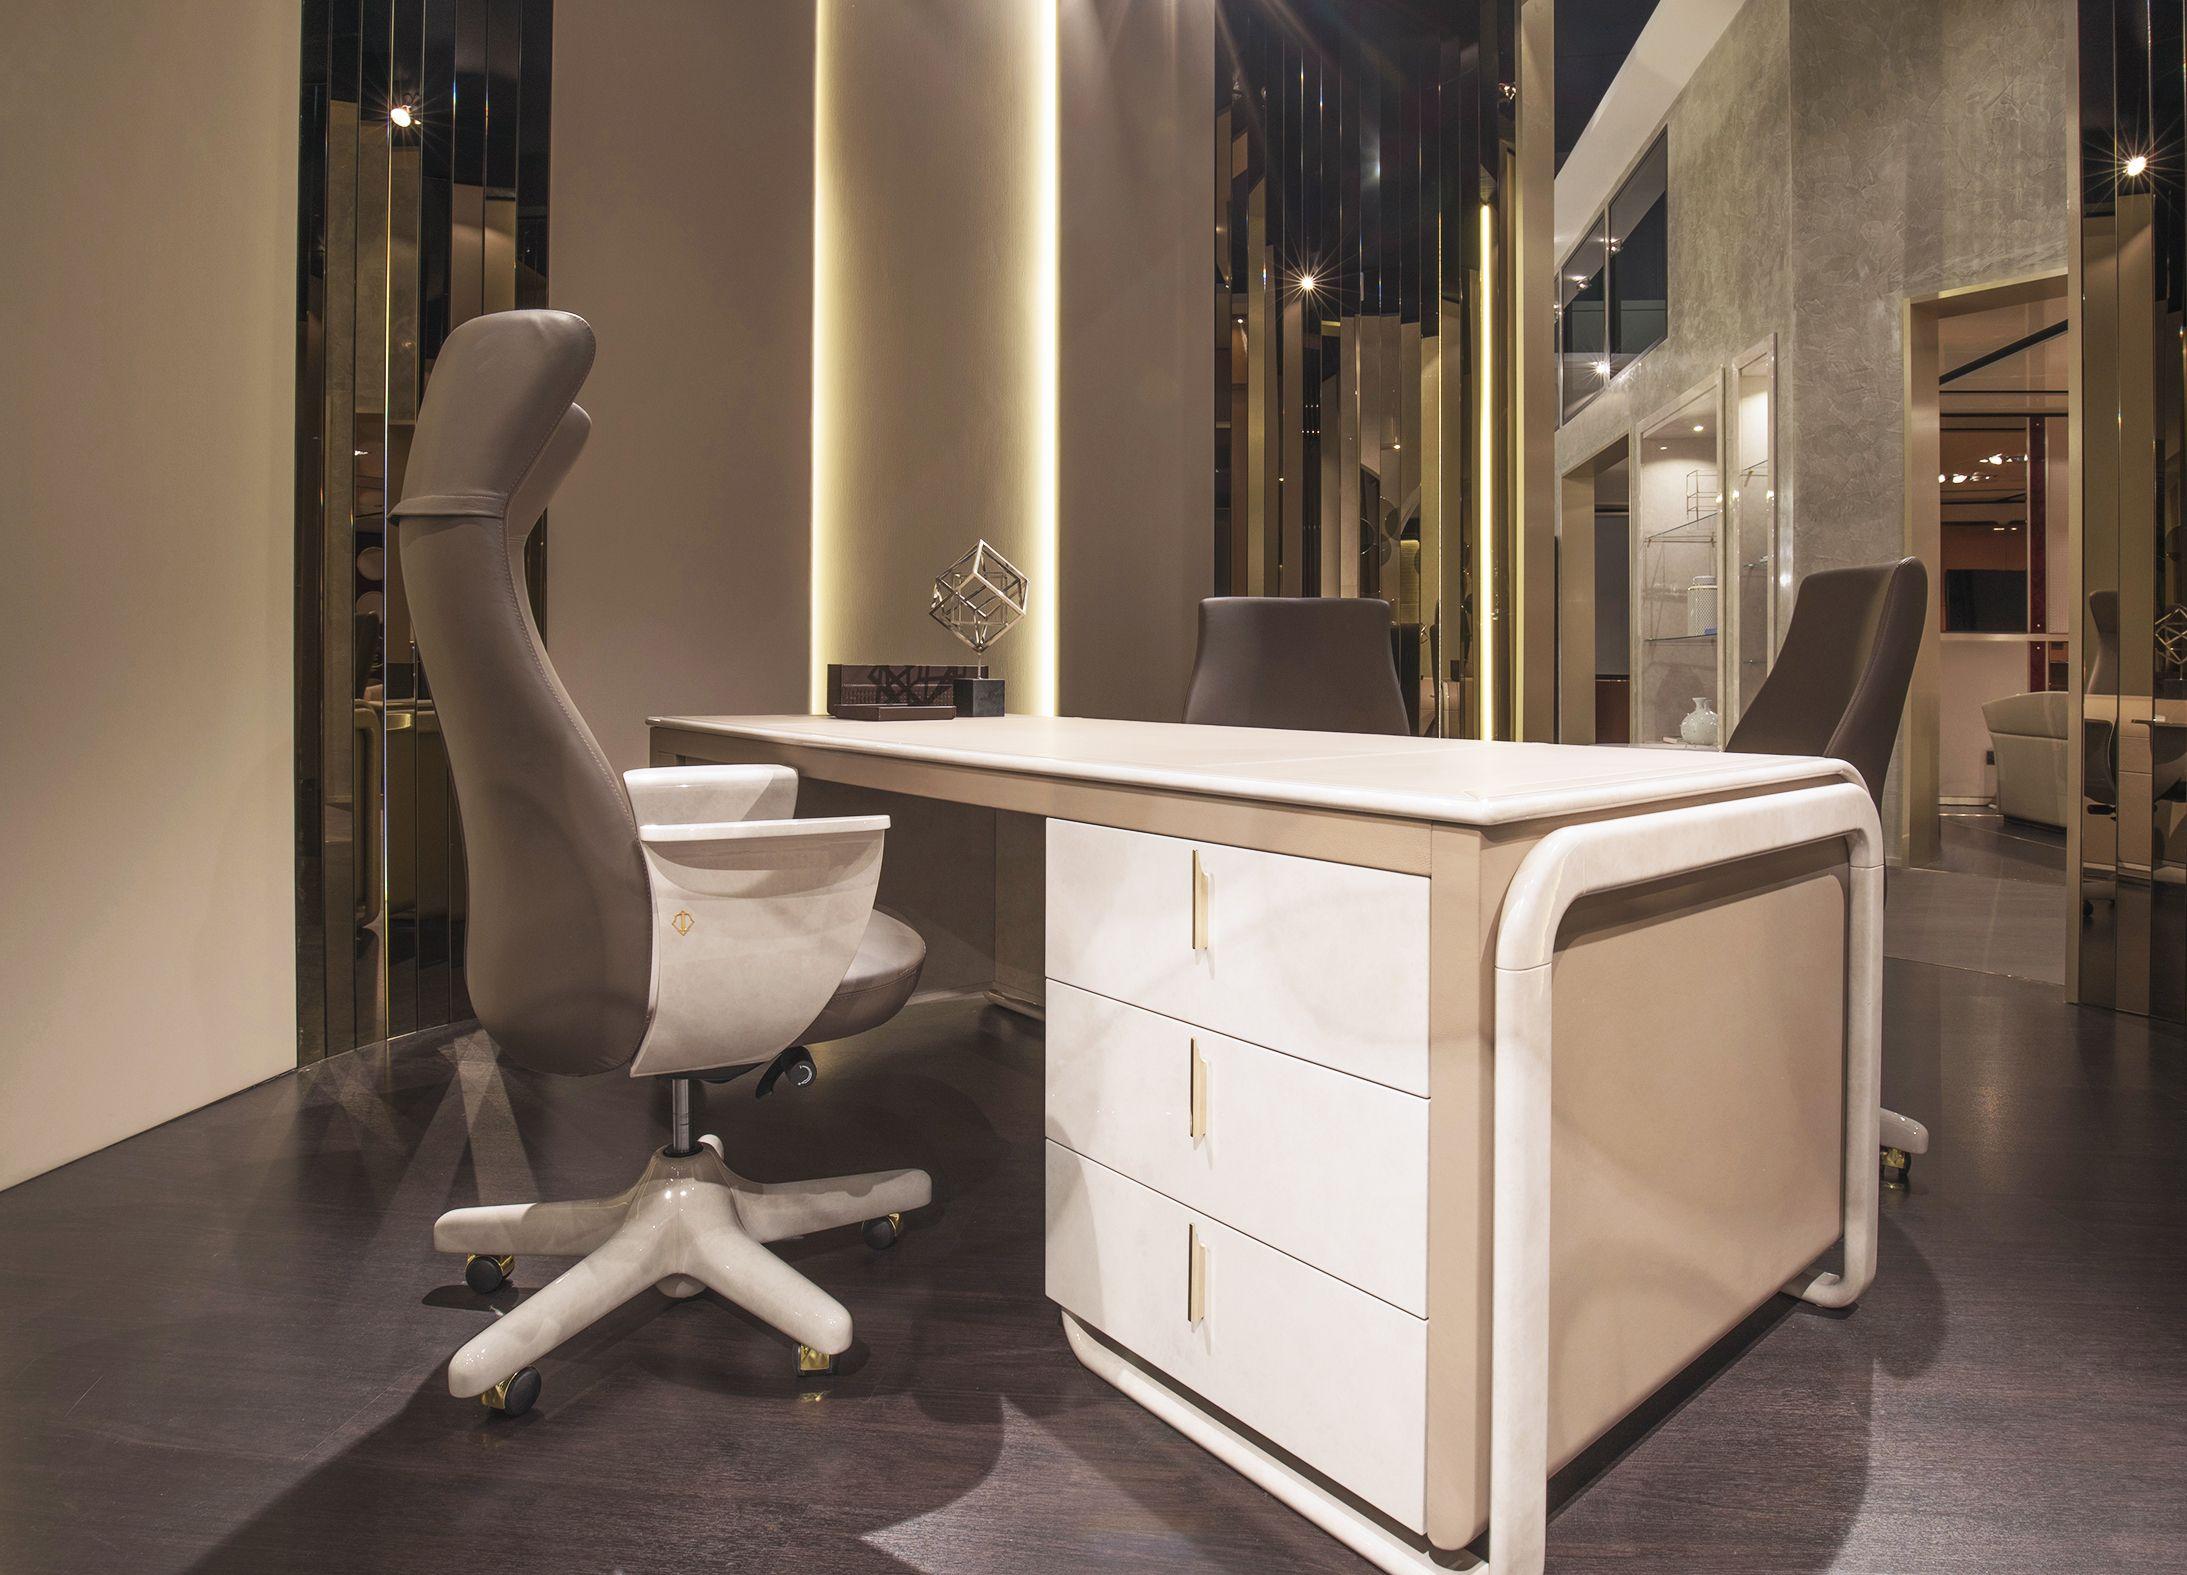 Italian Furniture for exclusive and modern design | INTERIOR ...